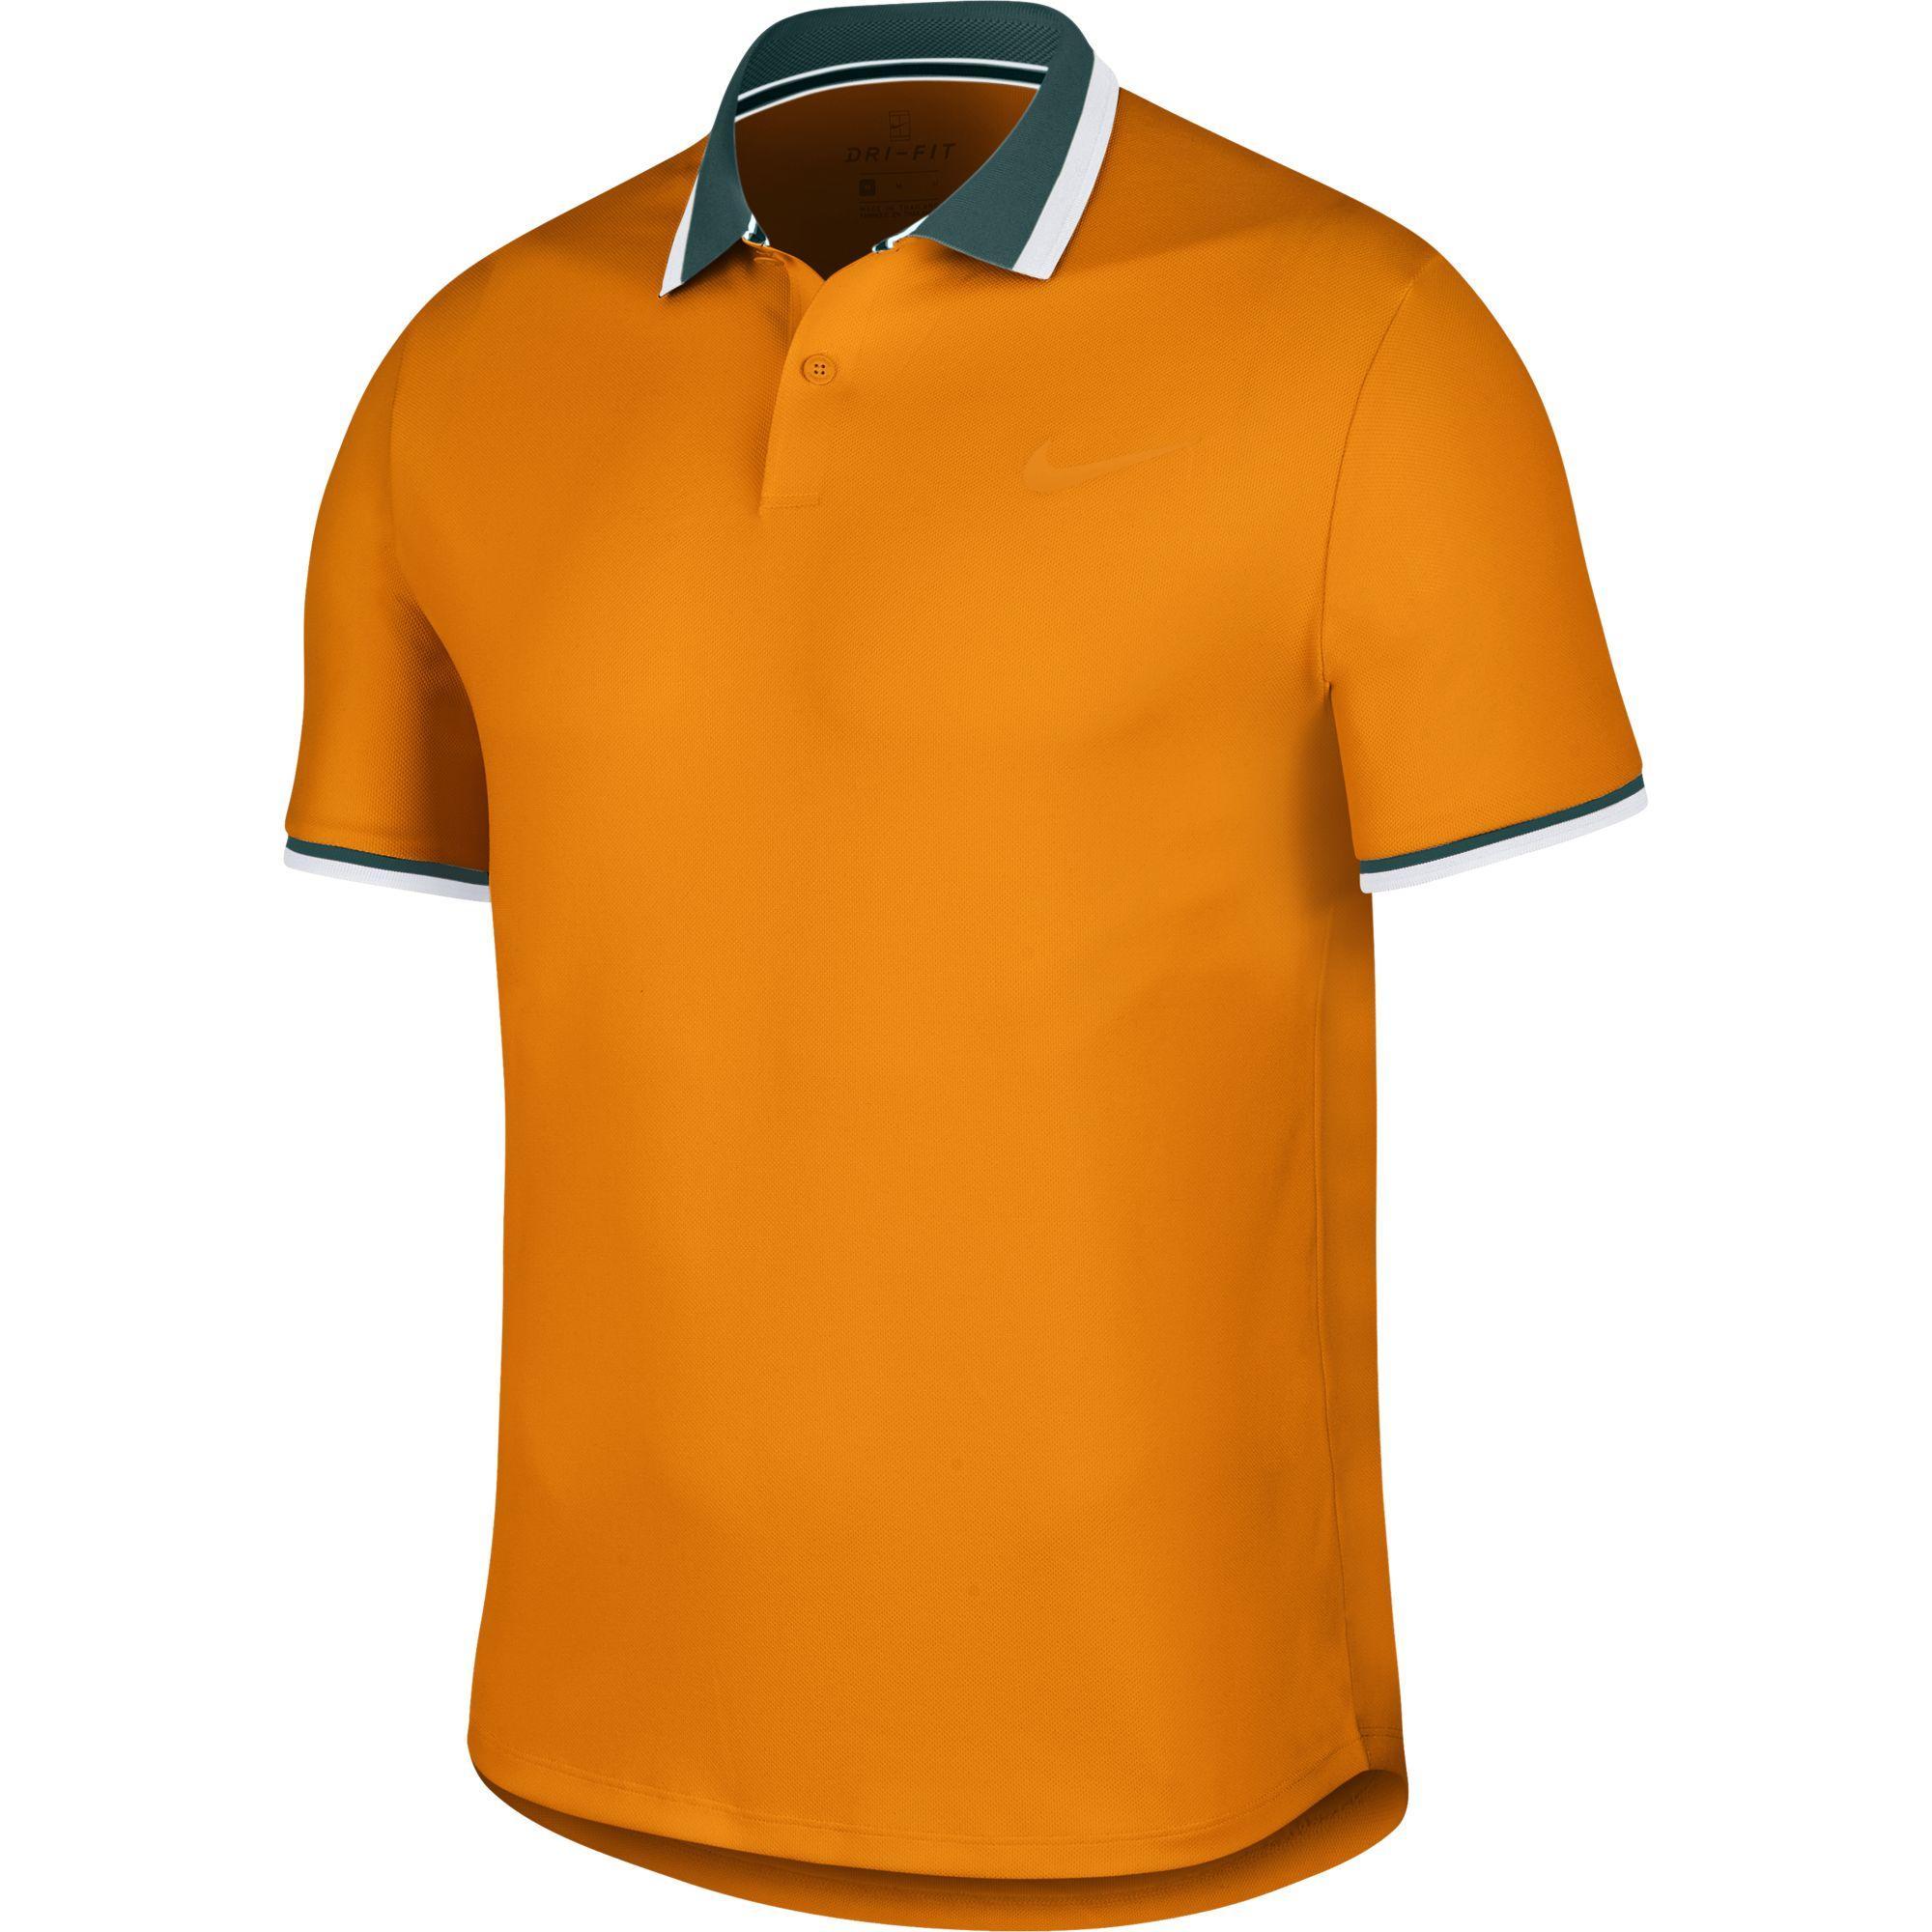 huge discount 3b3cc 7c9cd Nike Mens Advantage Polo - Orange Peel - Tennisnuts.com